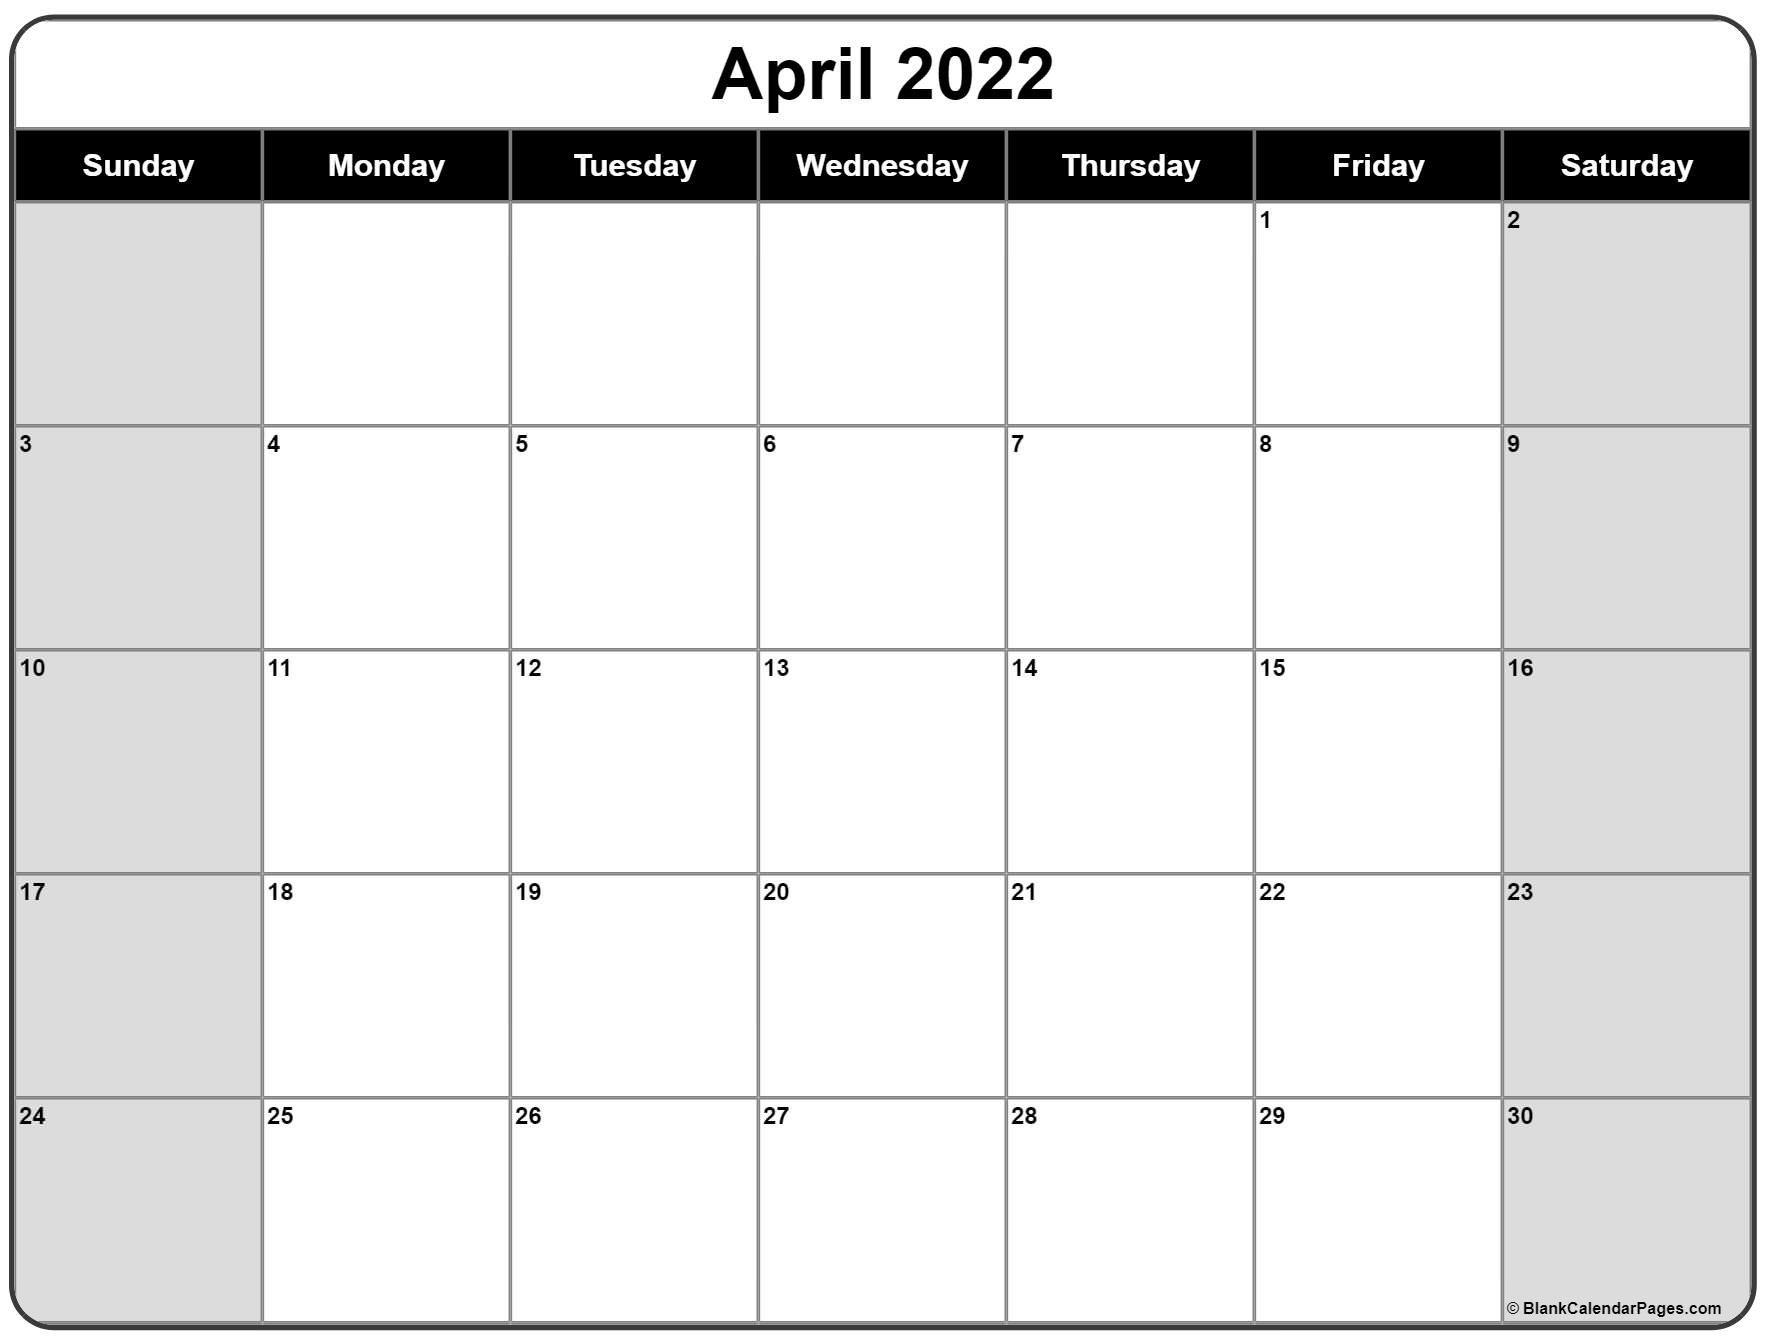 April 2022 Calendar | Free Printable Calendar Templates regarding Blank Calendar Printable April 2022